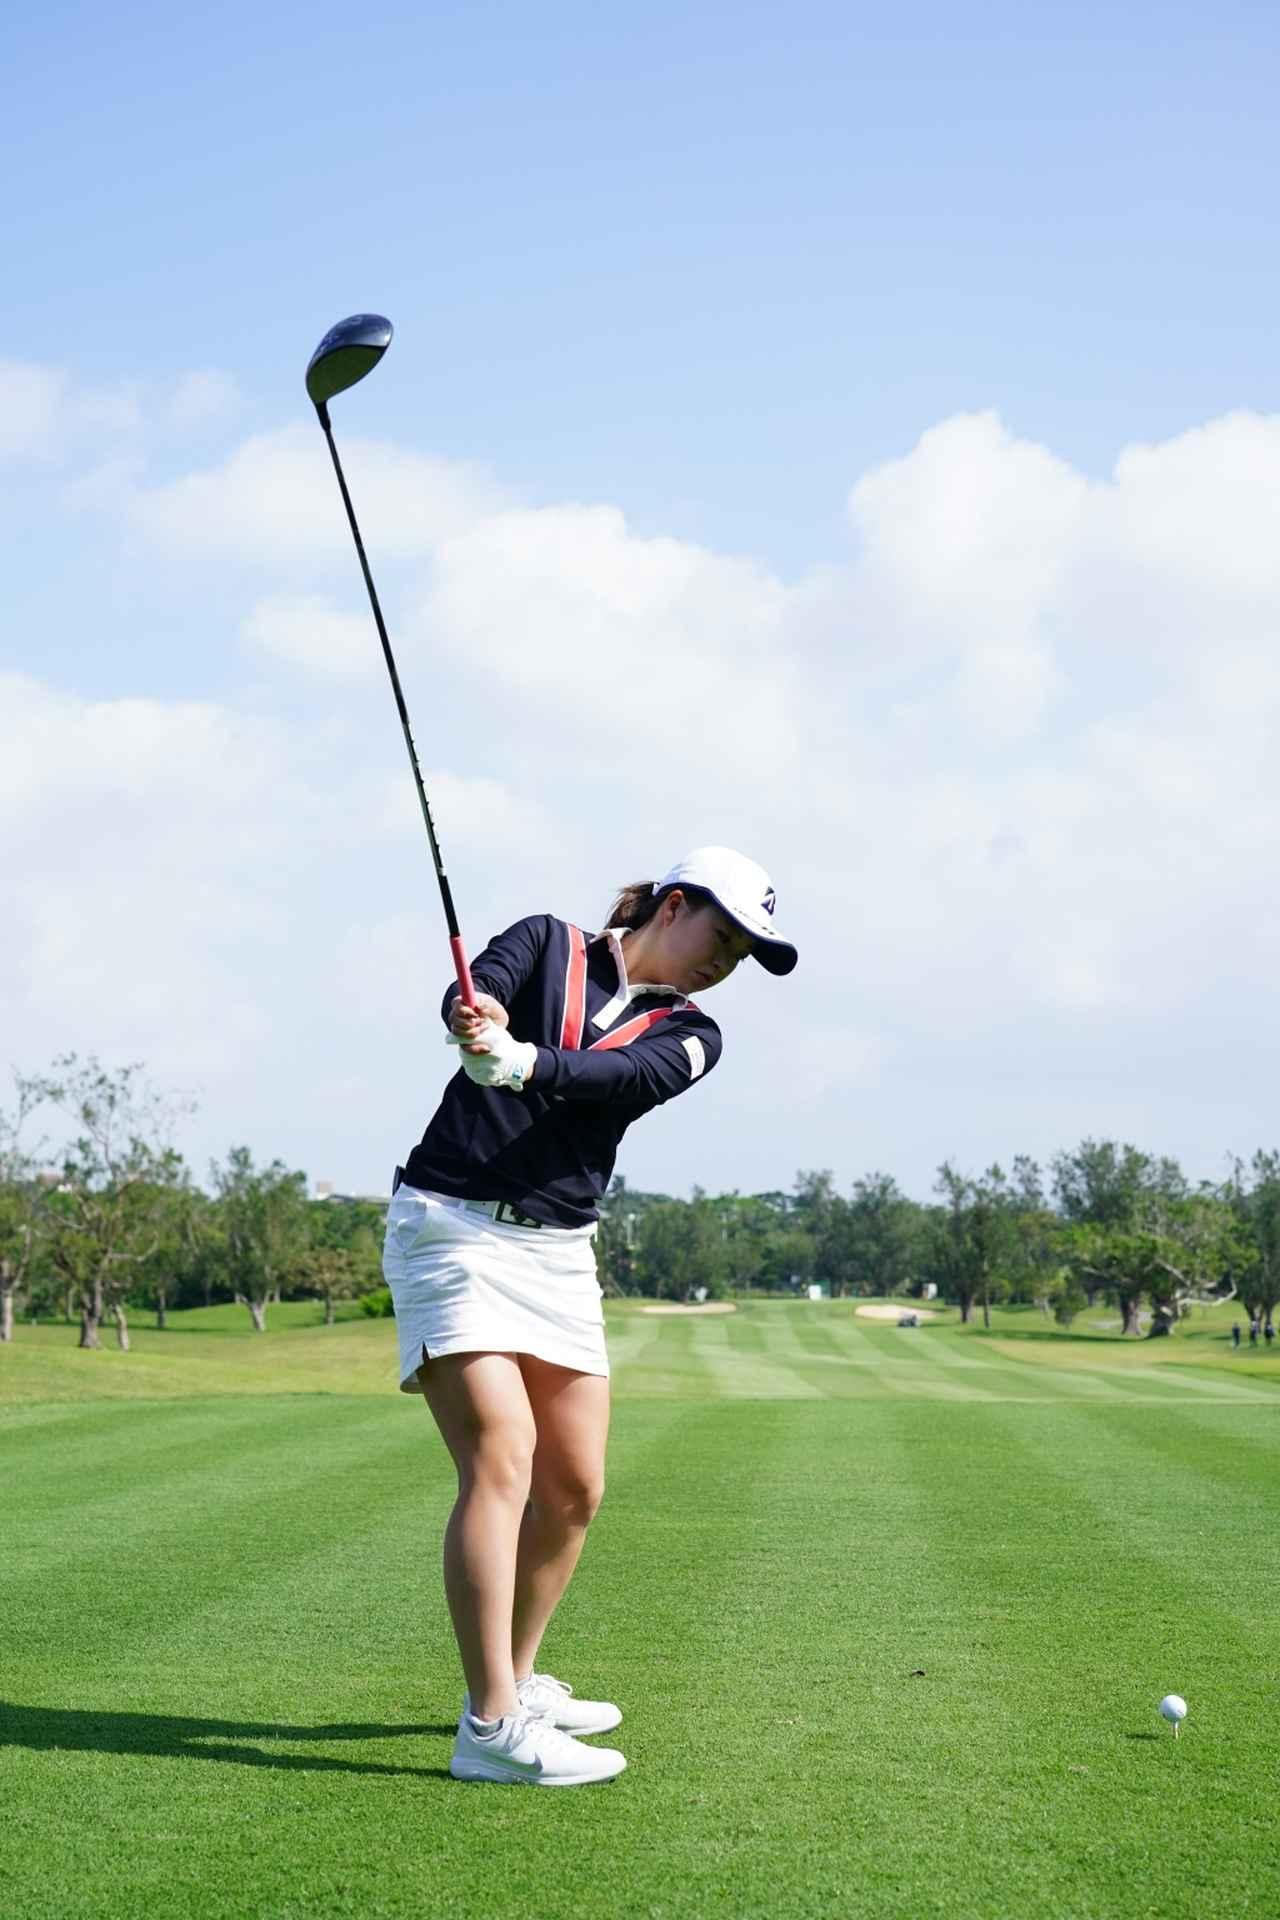 Images : 4番目の画像 - 丹萌乃のドライバー連続写真 - みんなのゴルフダイジェスト